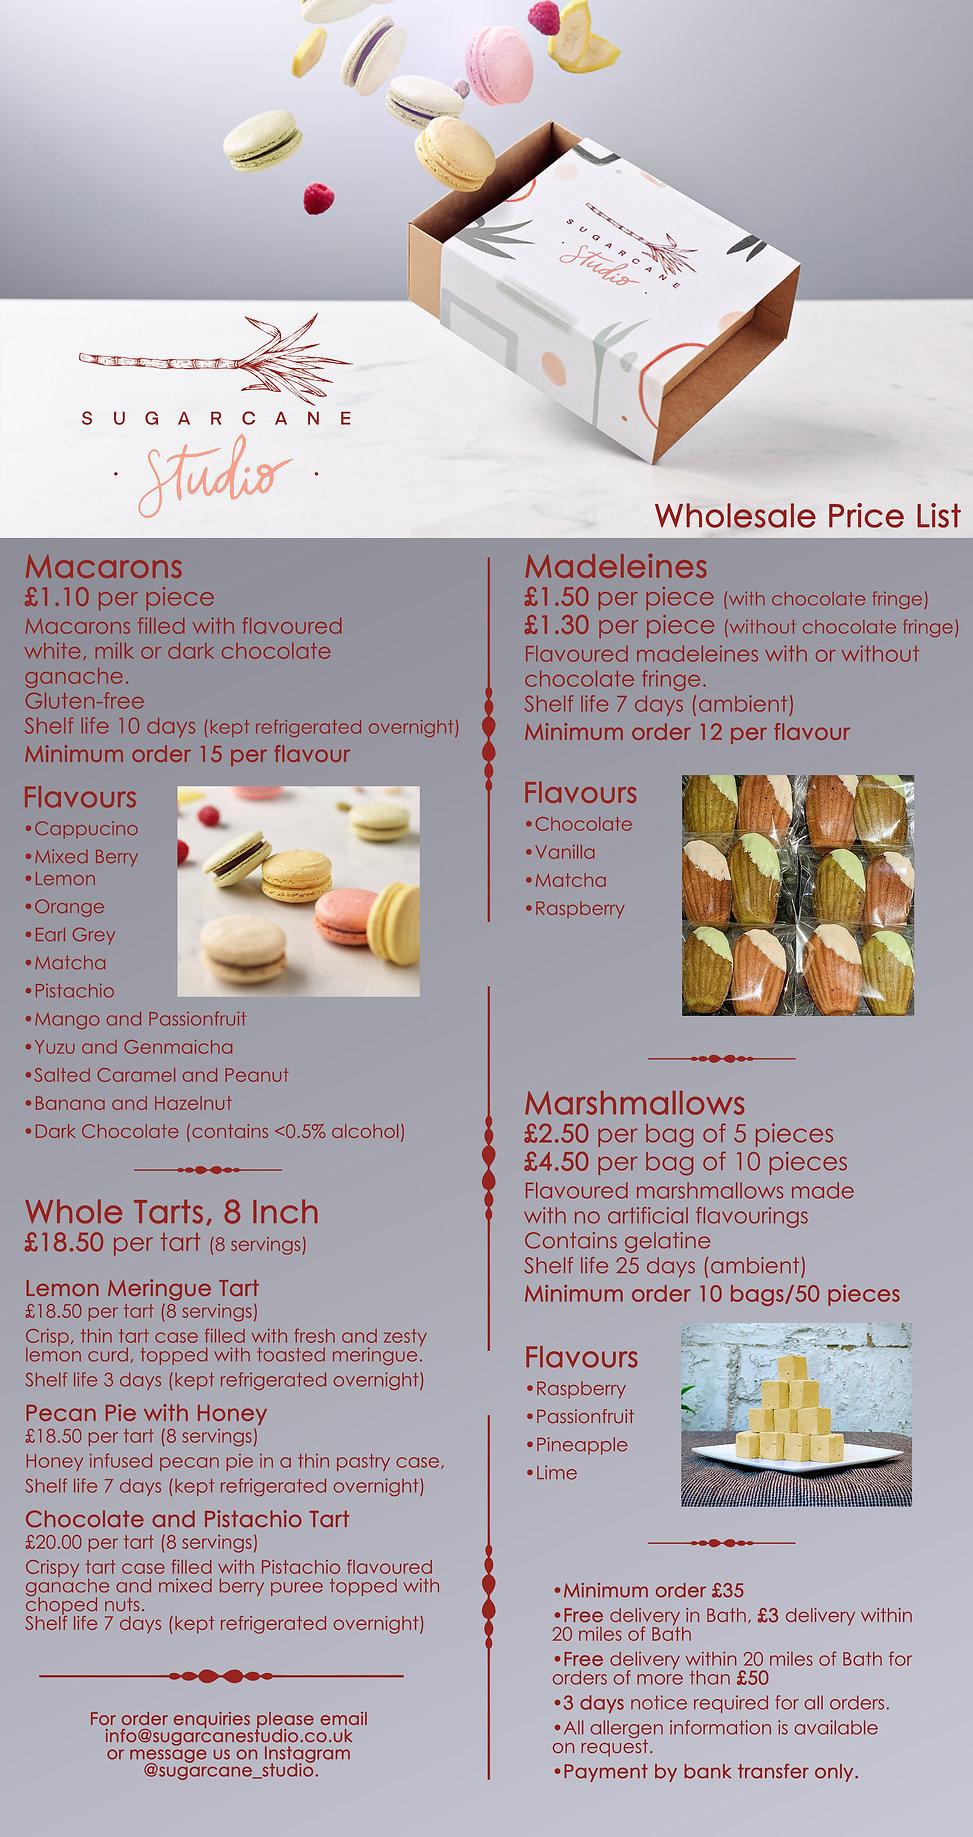 Sugarcane Studio Wholesale Prices.jpg